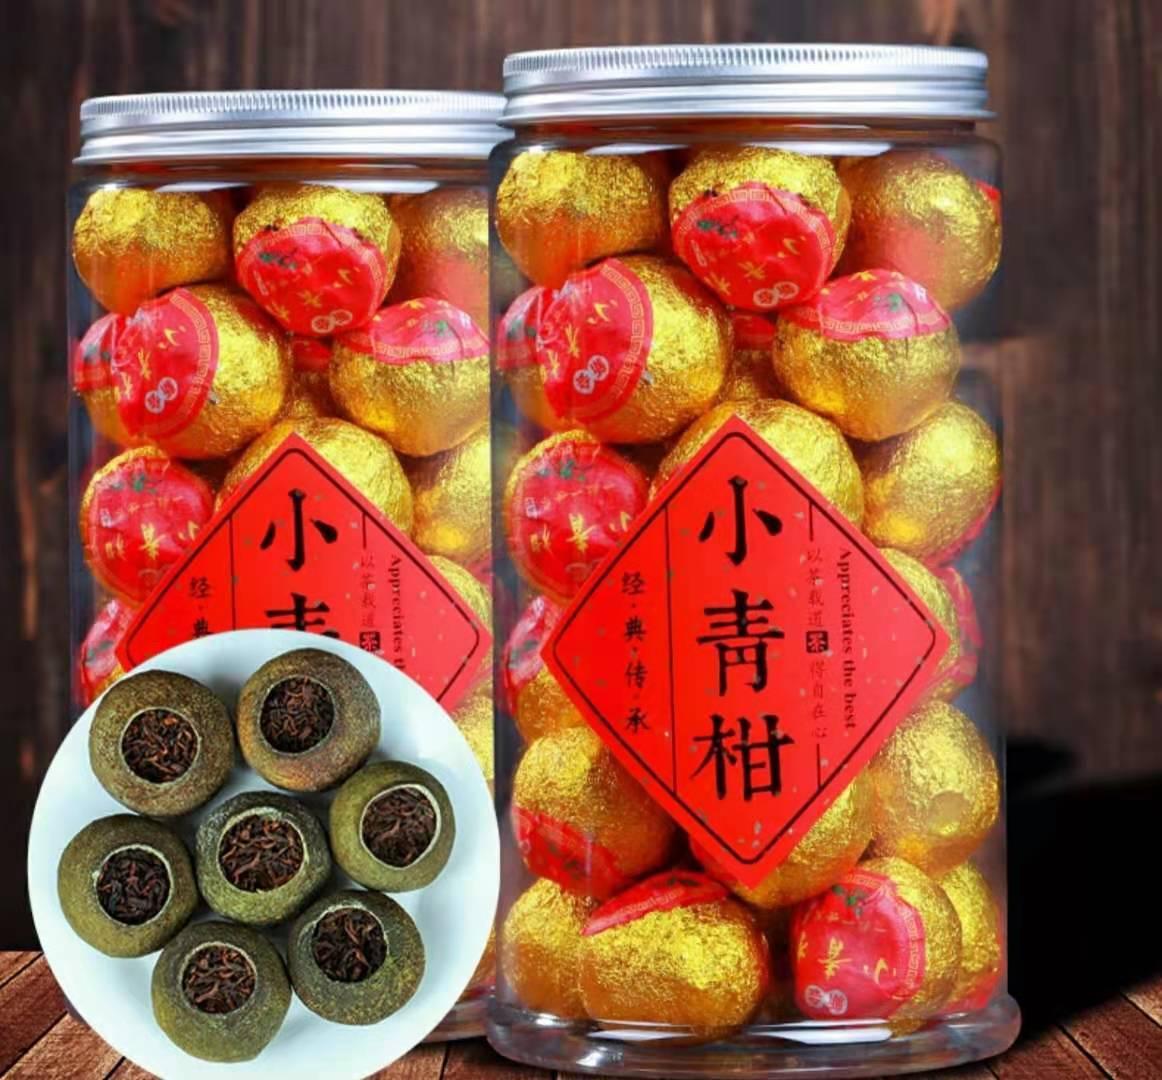 Шу Пуер чорний в Мандарині 1 шт. китайський чай, чай пуер, пуер в фруктах